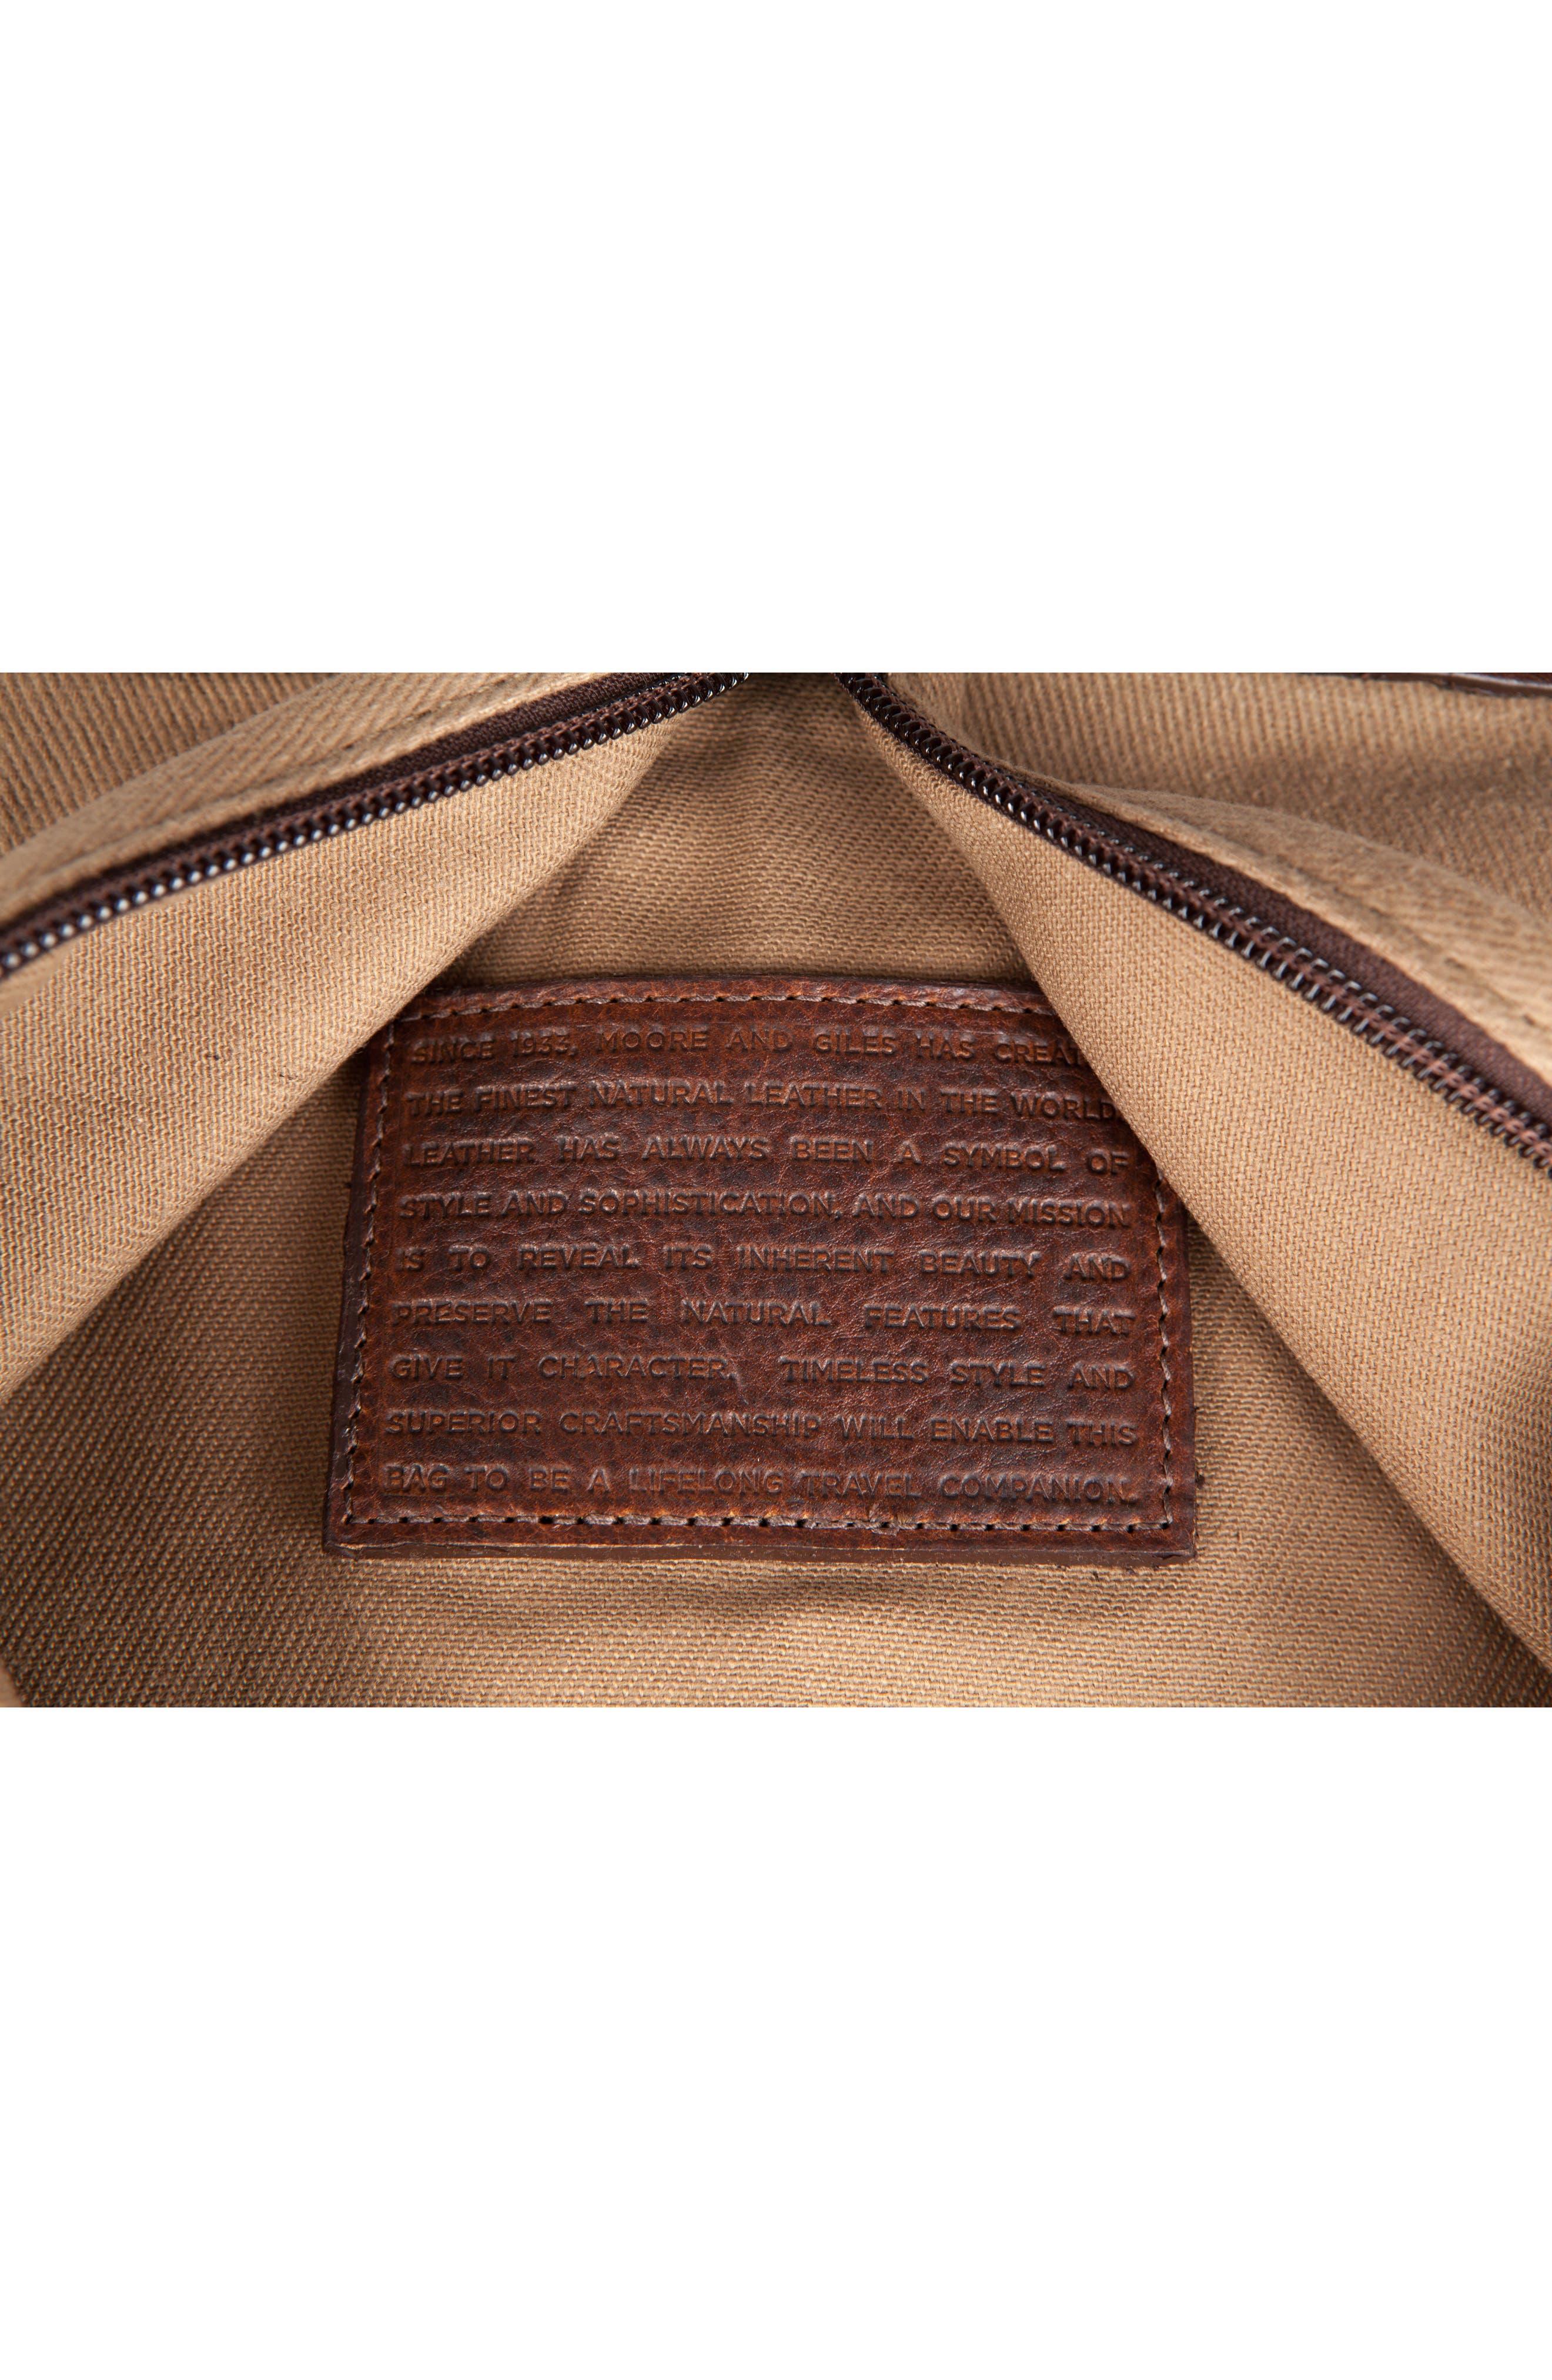 Holton Garment Bag,                             Alternate thumbnail 5, color,                             Brushed Tan Twill